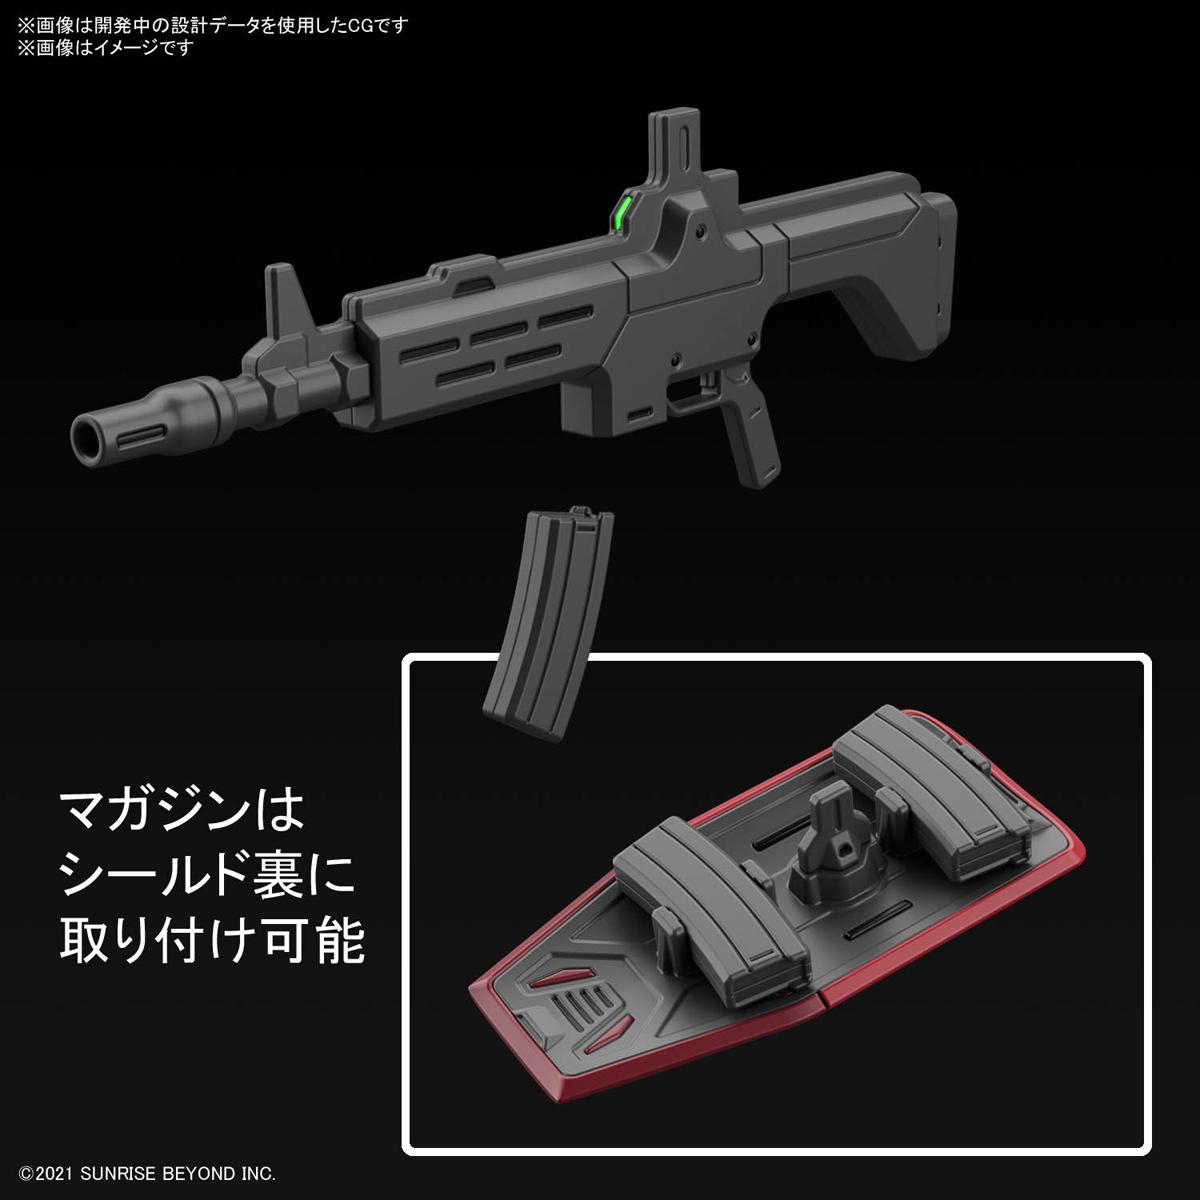 HG 1/72『ブレイディハウンド』境界戦機 プラモデル-017